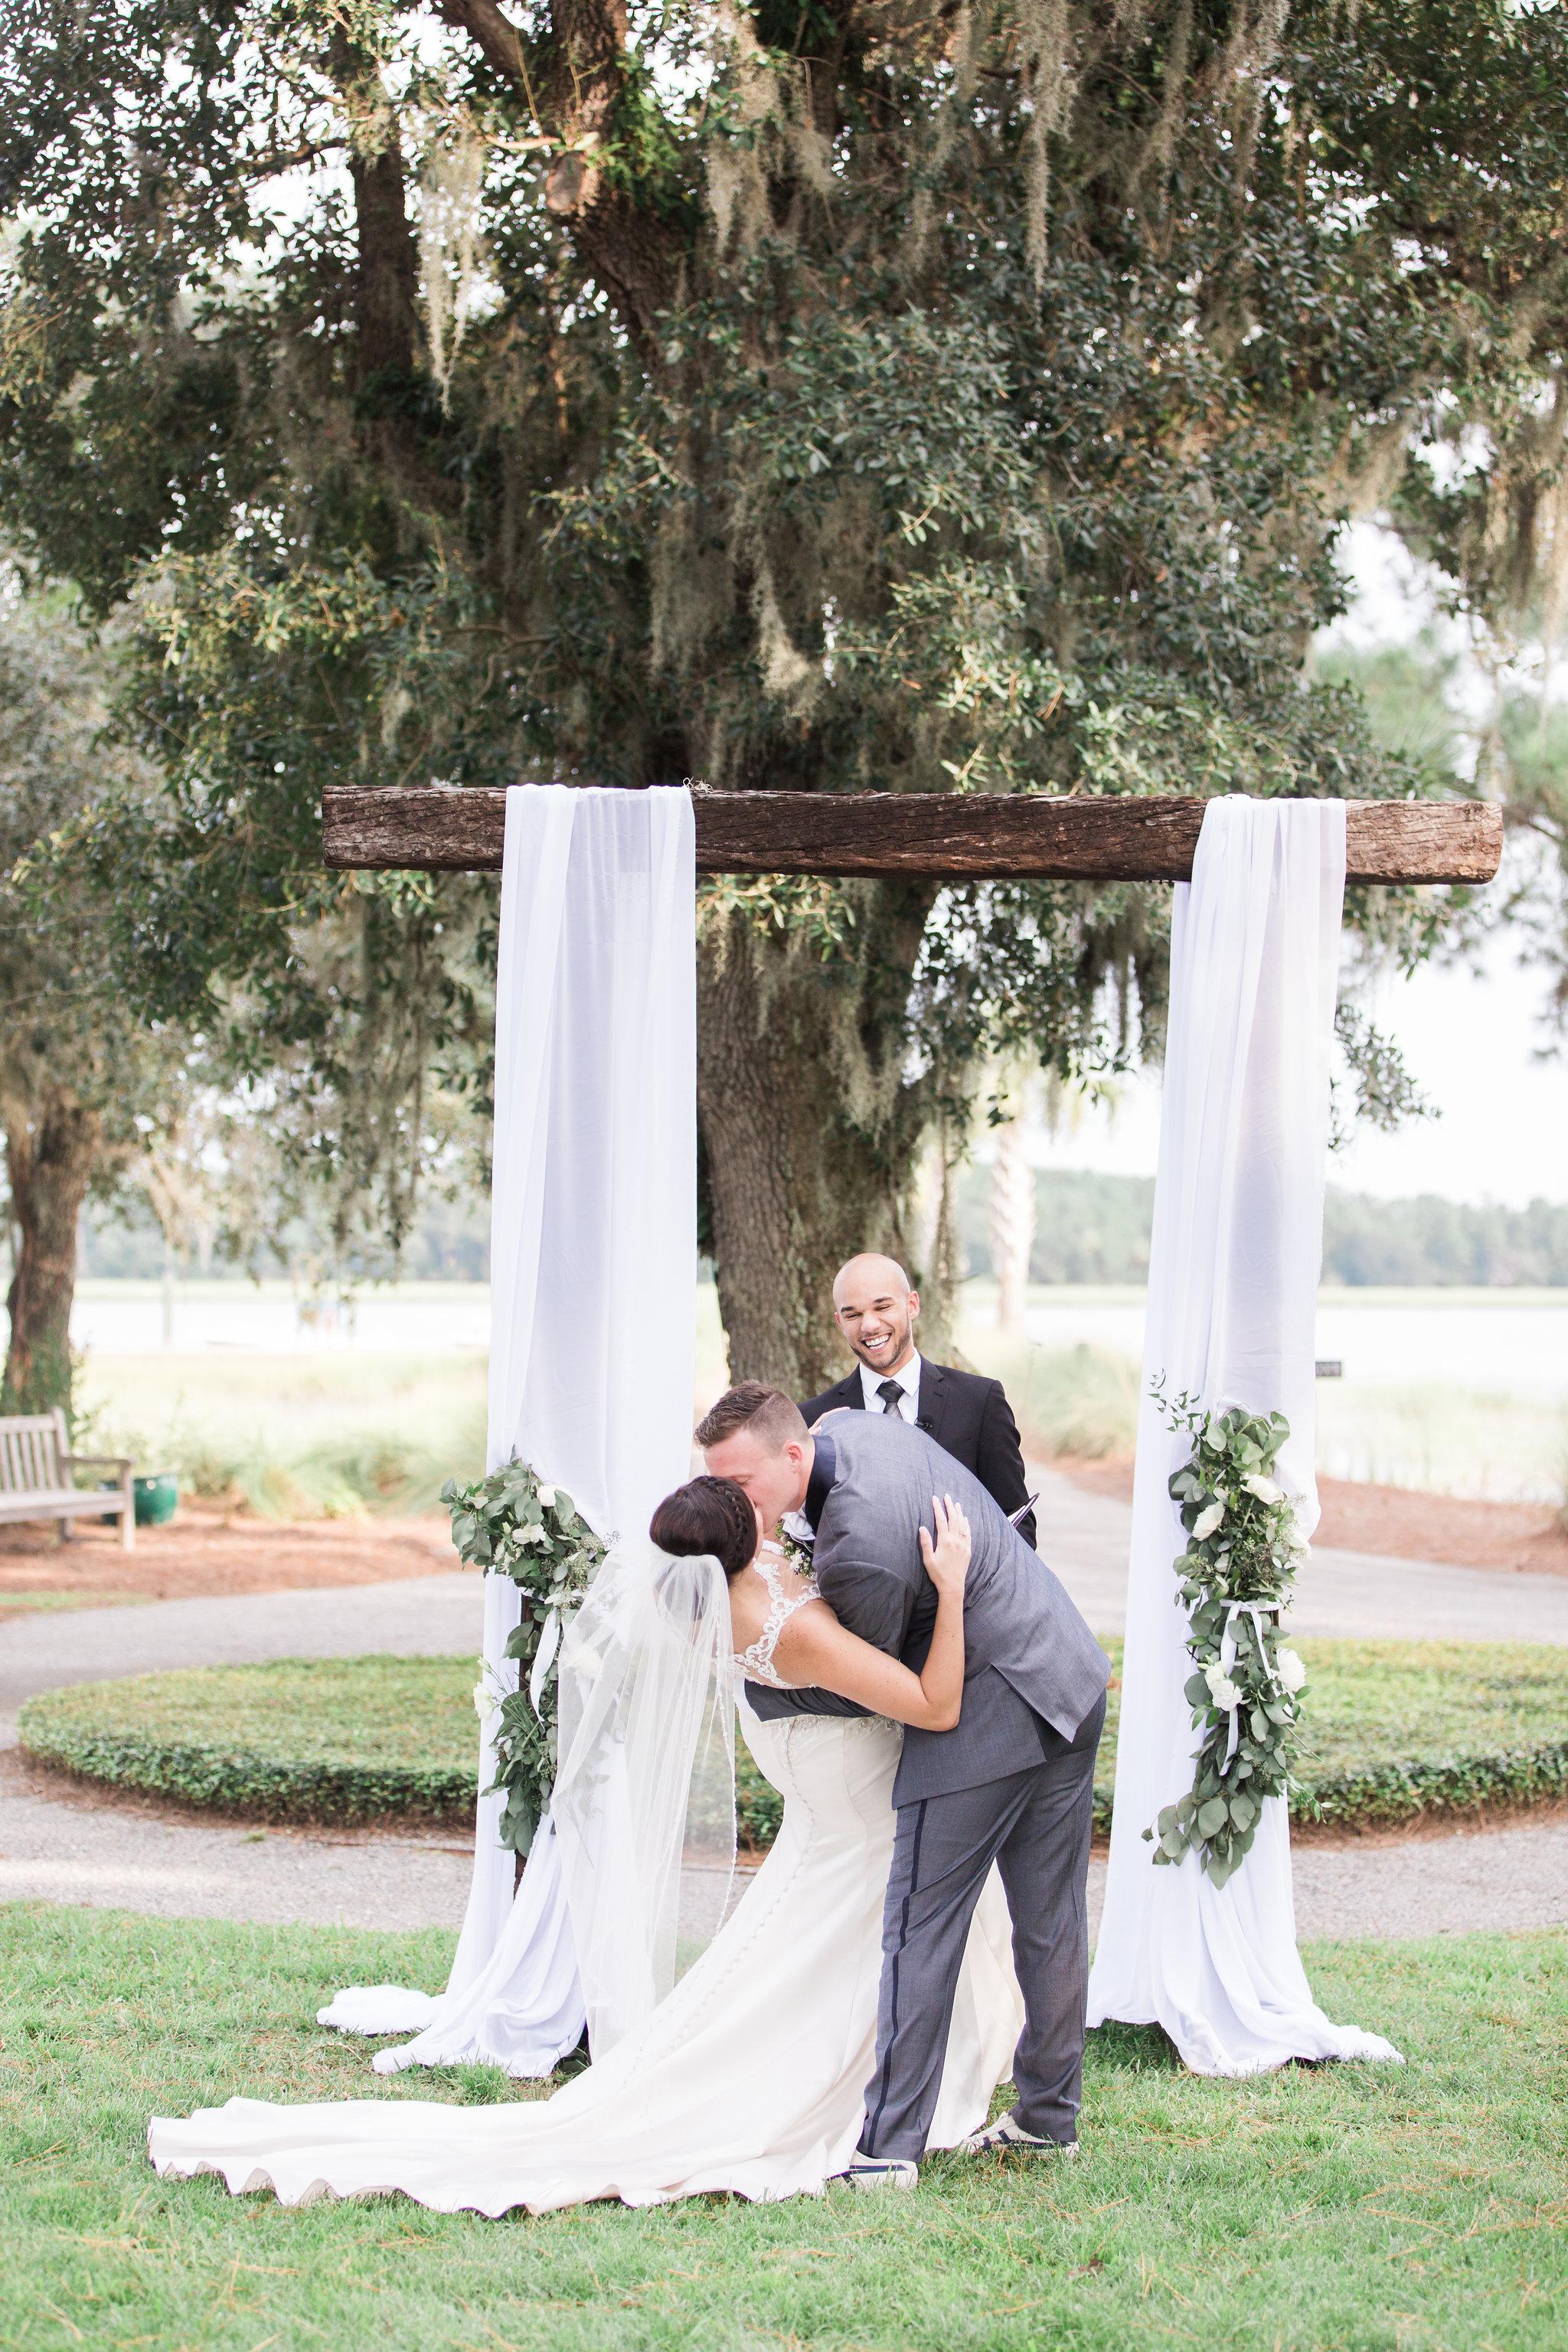 apt-b-photography-lauren-graham-oldfield-wedding-south-carolina-wedding-photographer-savannah-wedding-lowcountry-wedding-coastal-wedding-navy-wedding-plantation-wedding-first-kiss-28.JPG